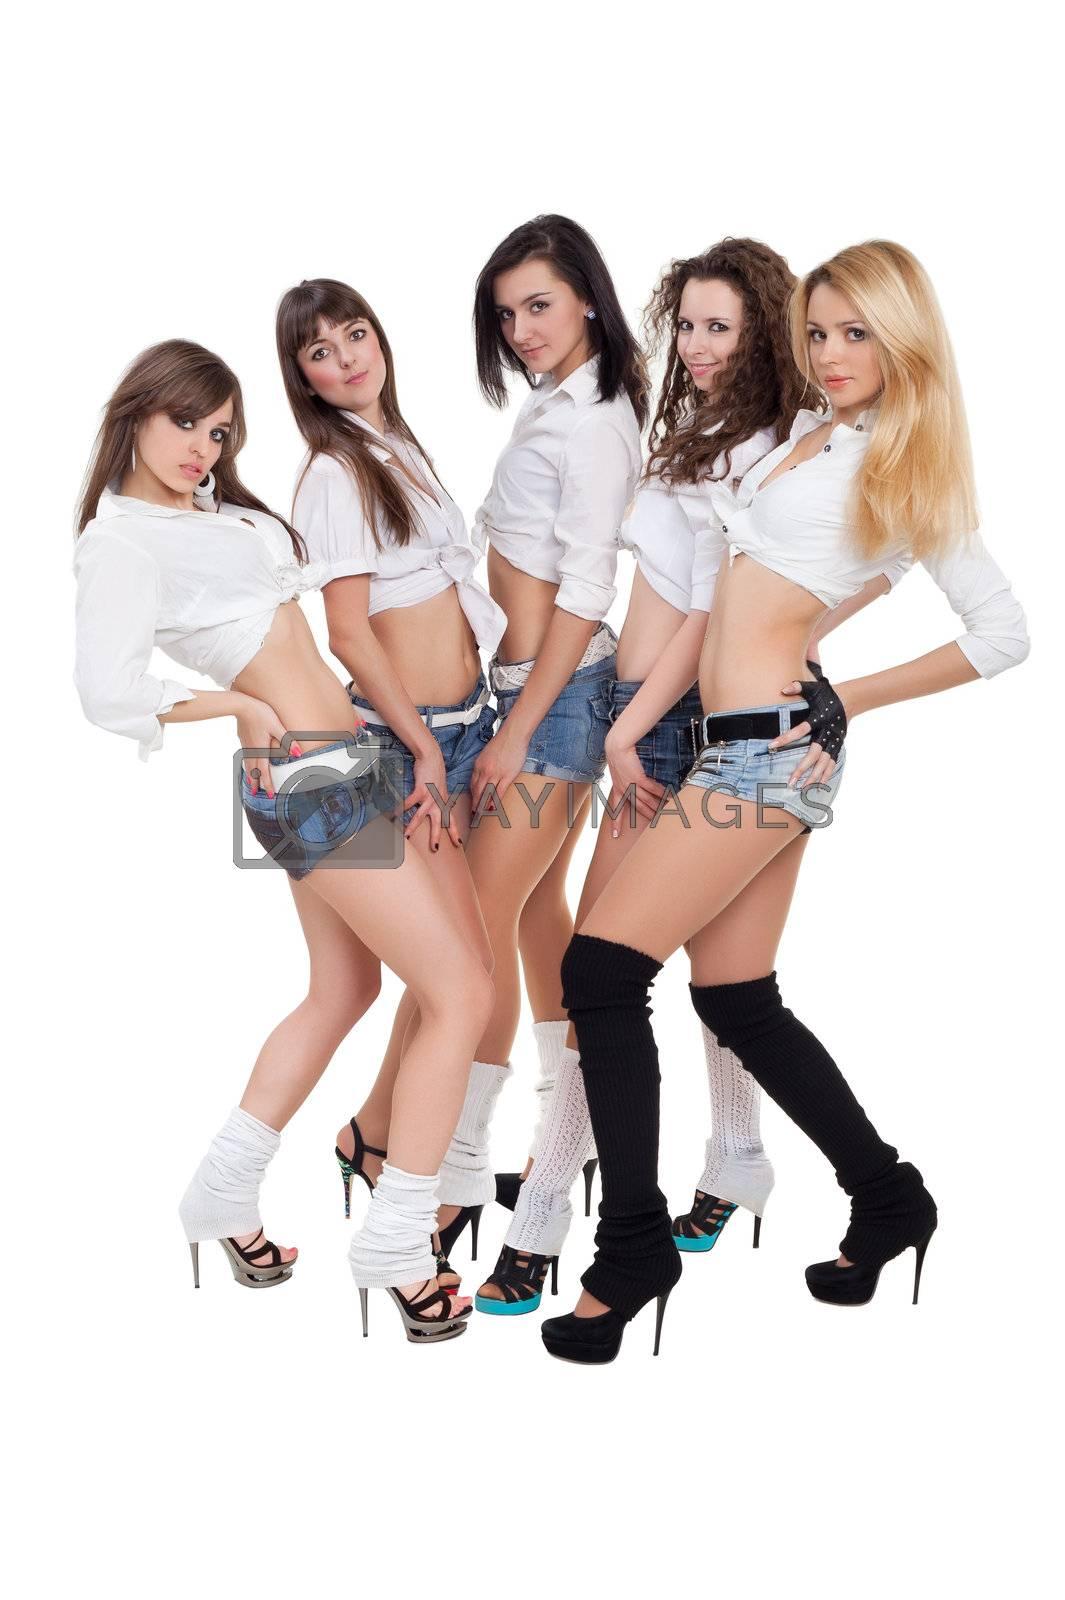 Modern ballet of five dancers posing for photo